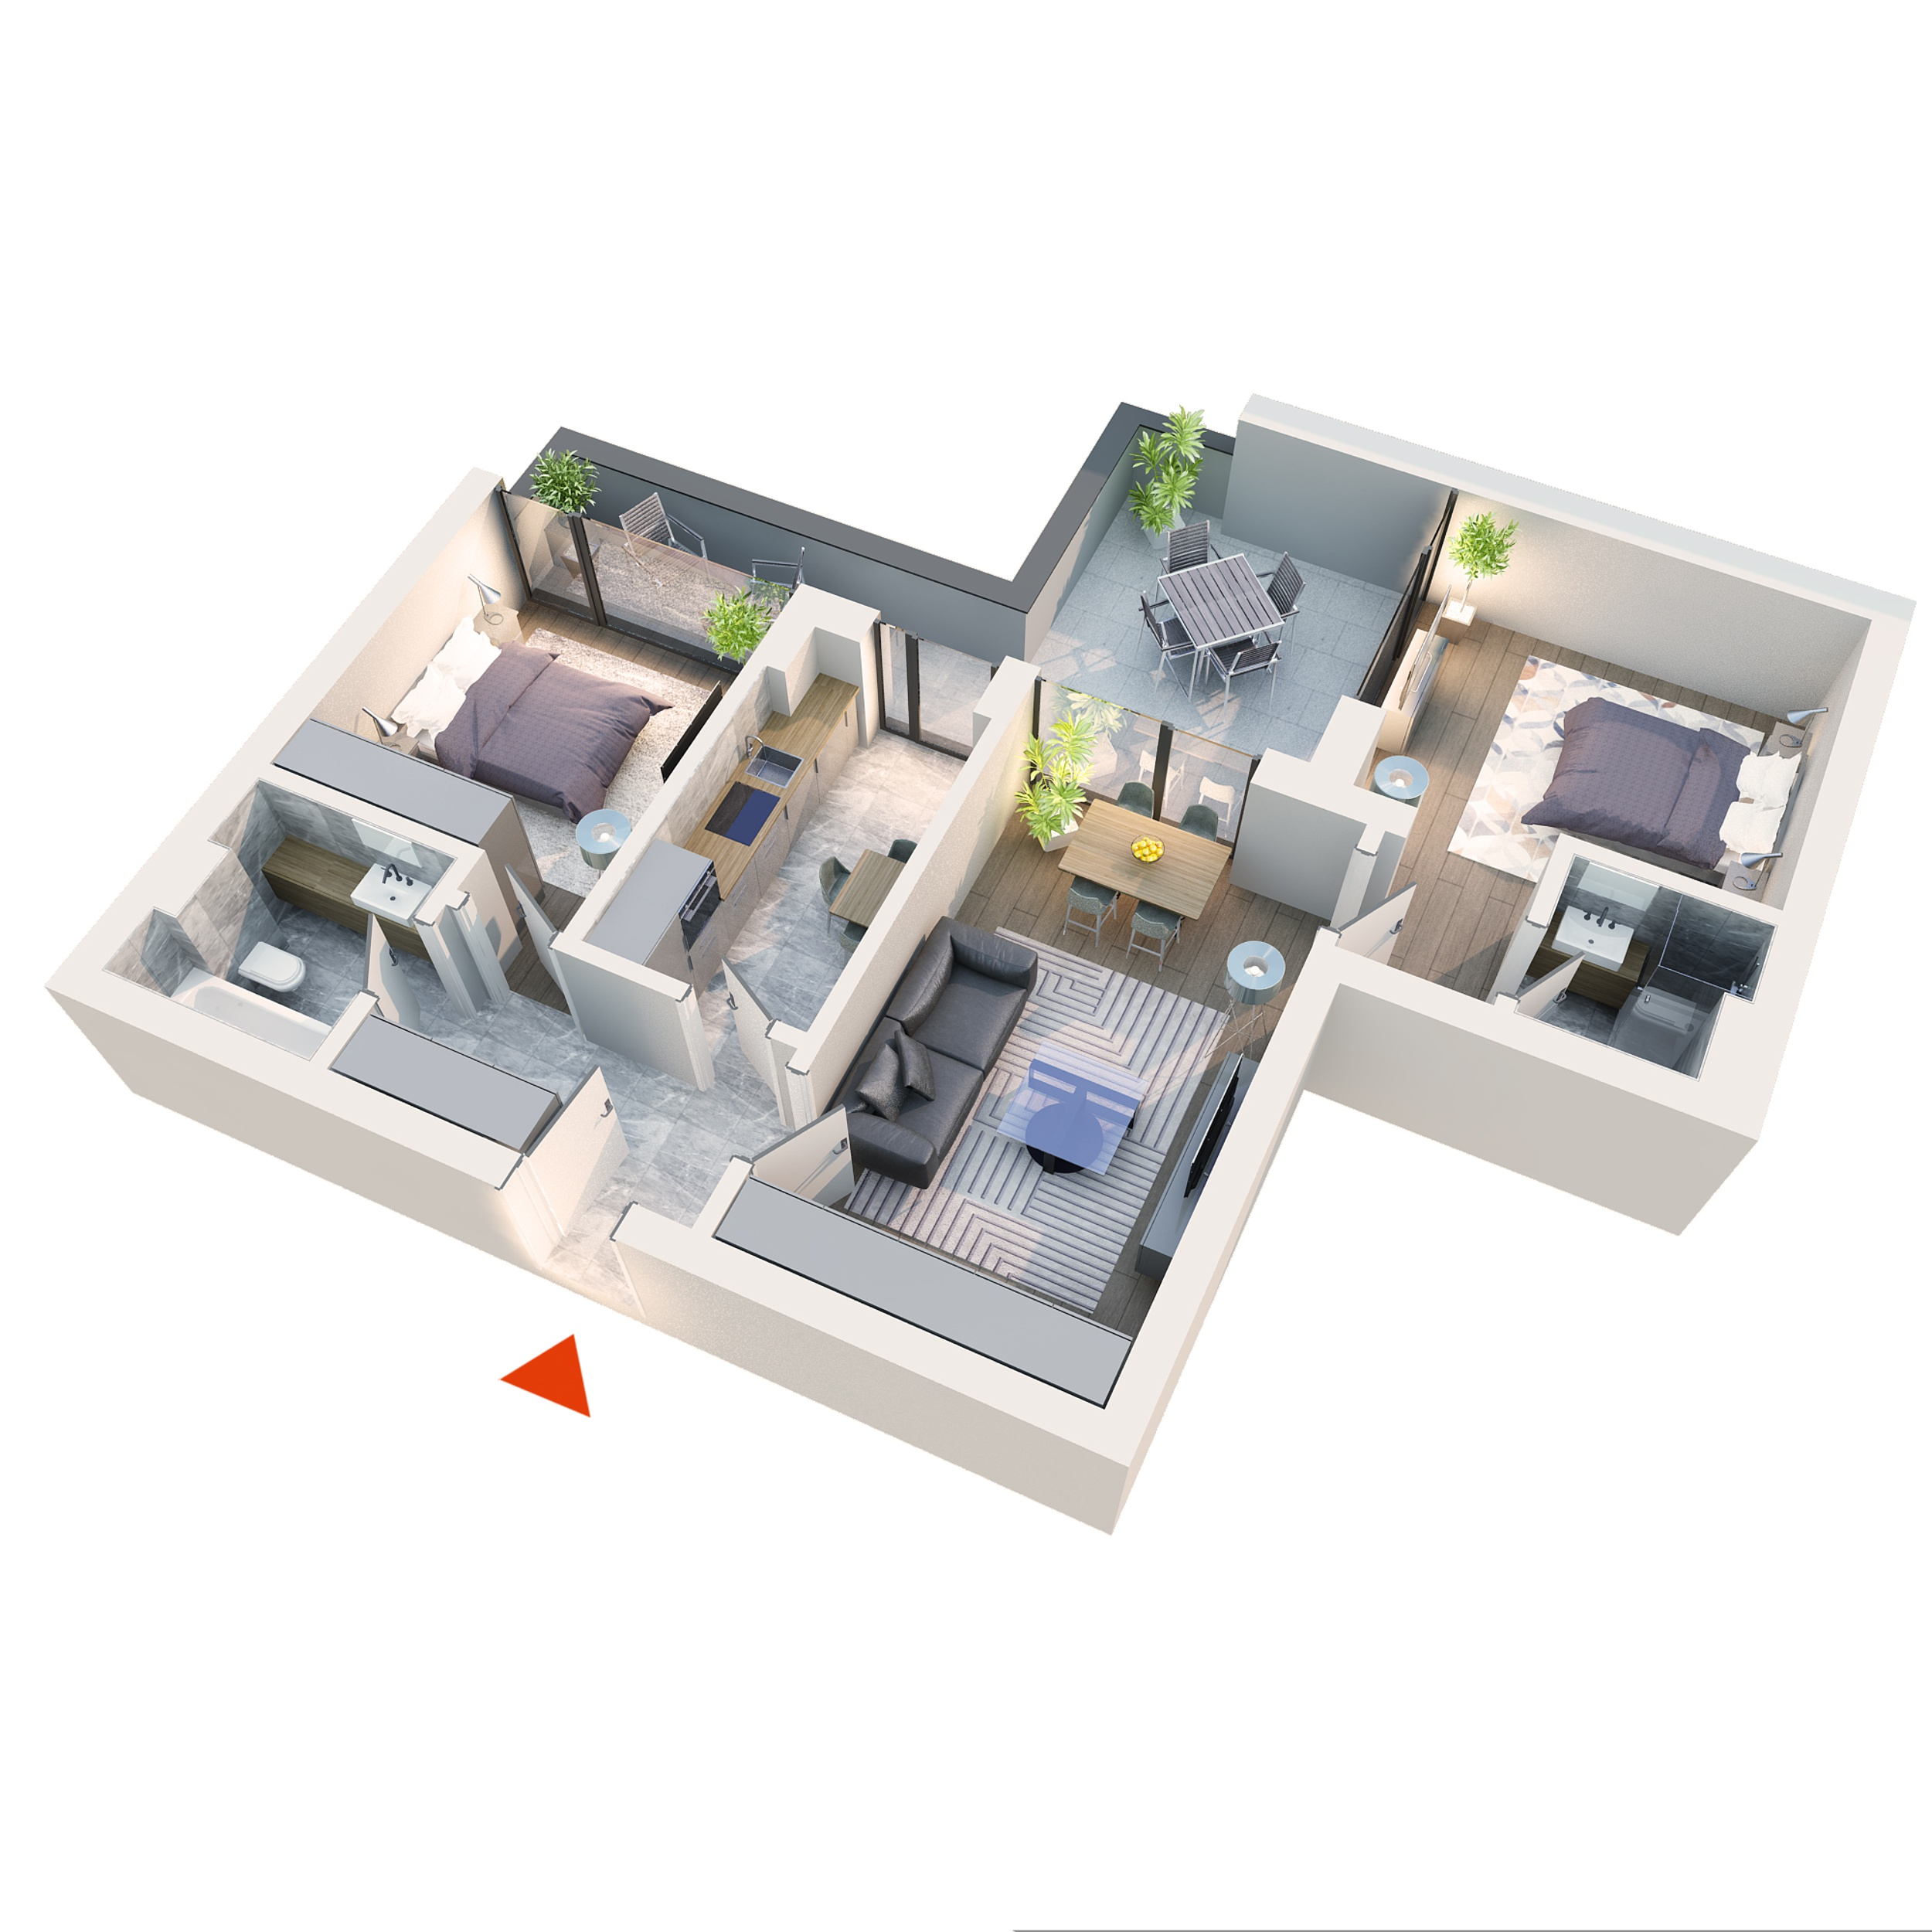 Apartament 3 camere tip 3B5 | Terasa | Etaj 1 – 4 | Corp C3 C4 | Faza 2